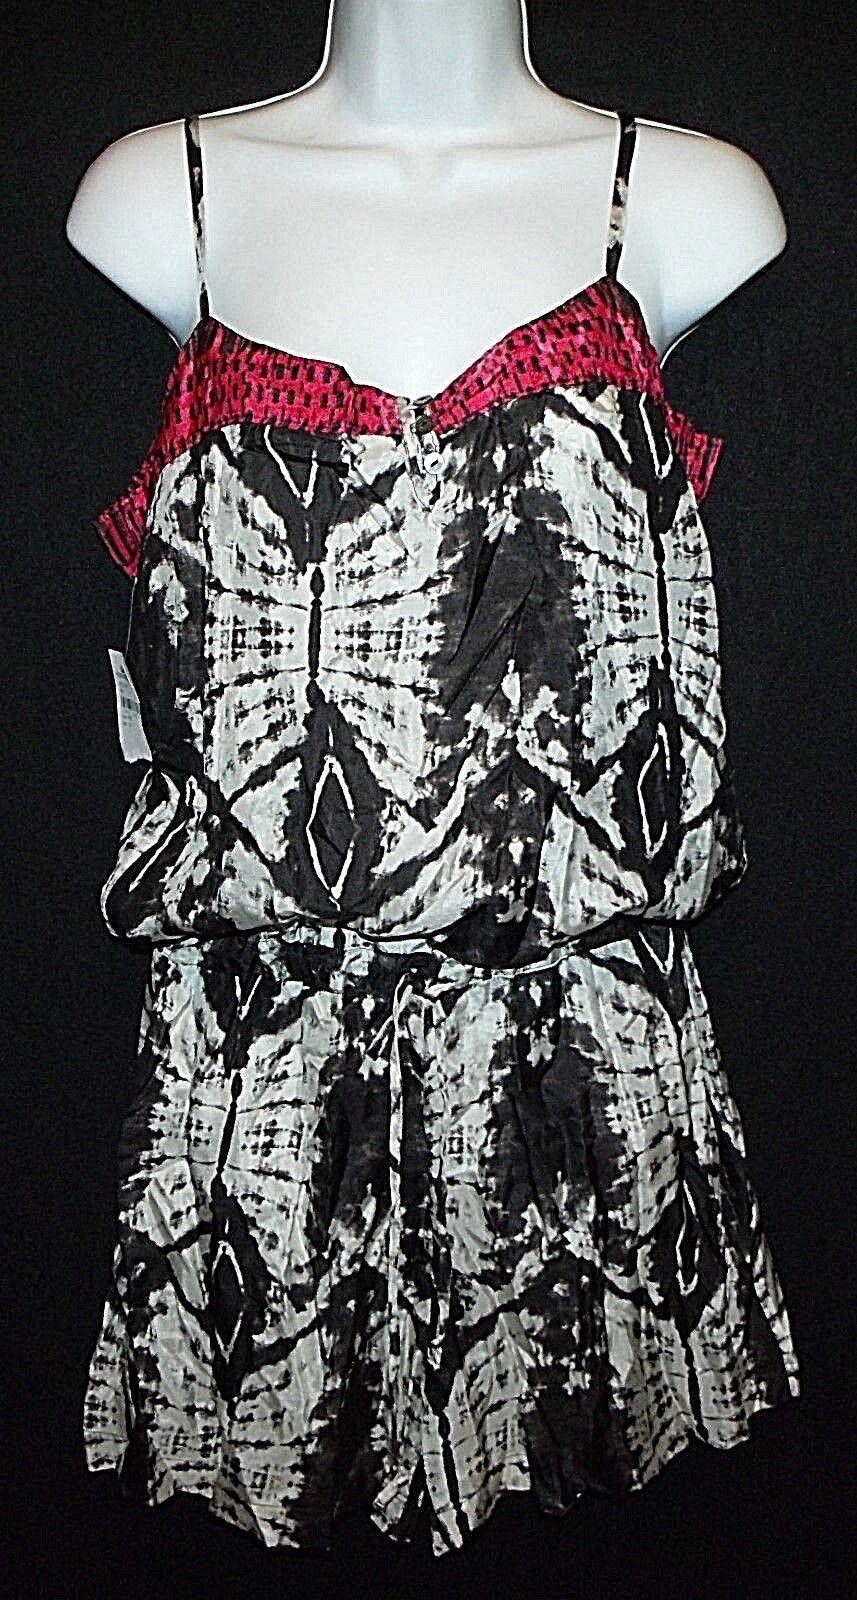 New DA-NANG Nordstrom printed 100 silk short romper evil eye B W batik tie dye M